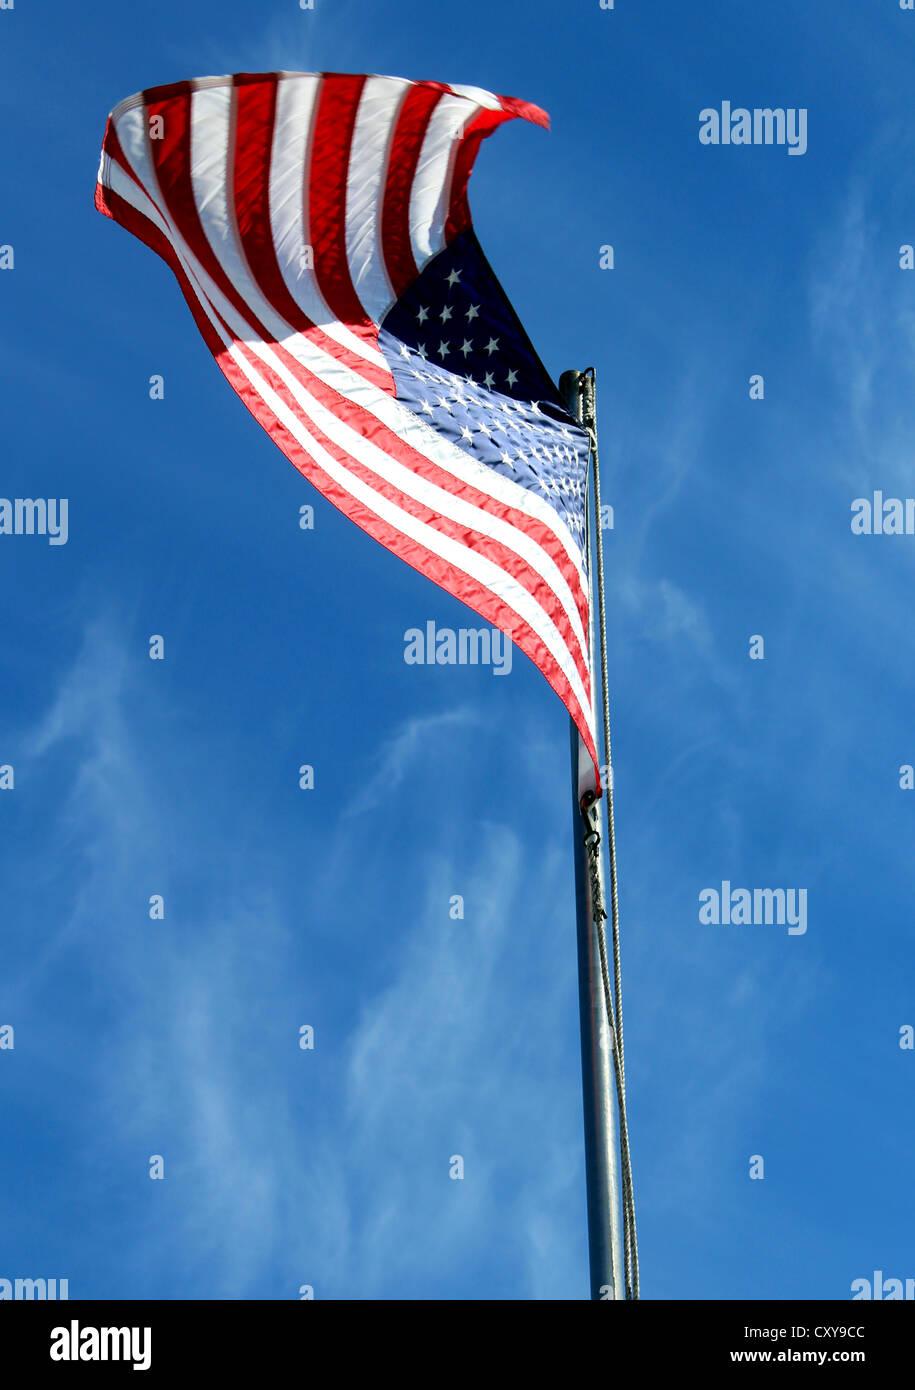 USA flag, American flag, 'Stars and Stripes' United States of America flag - Stock Image